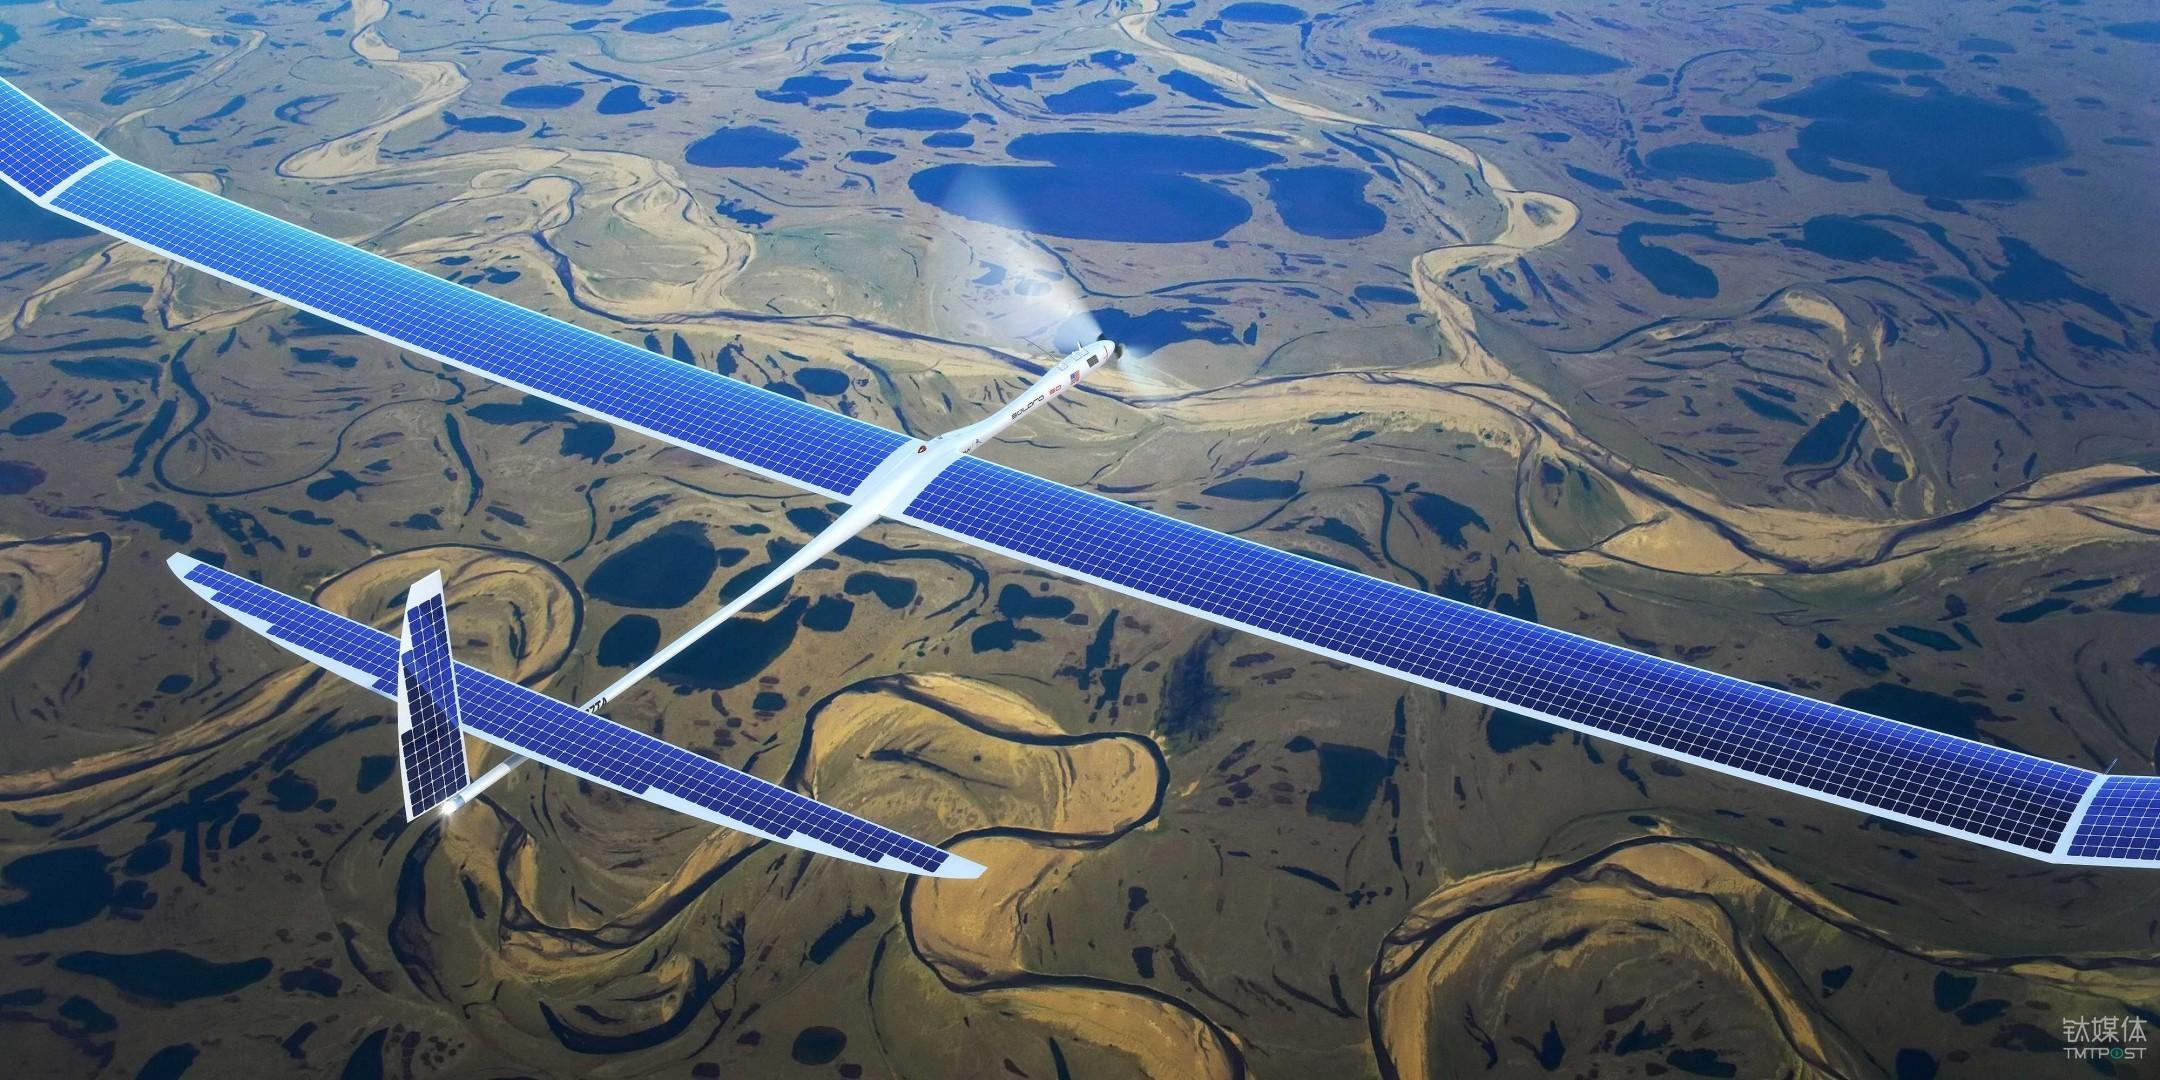 Titan Aerospace 的 Solara 太阳能飞机